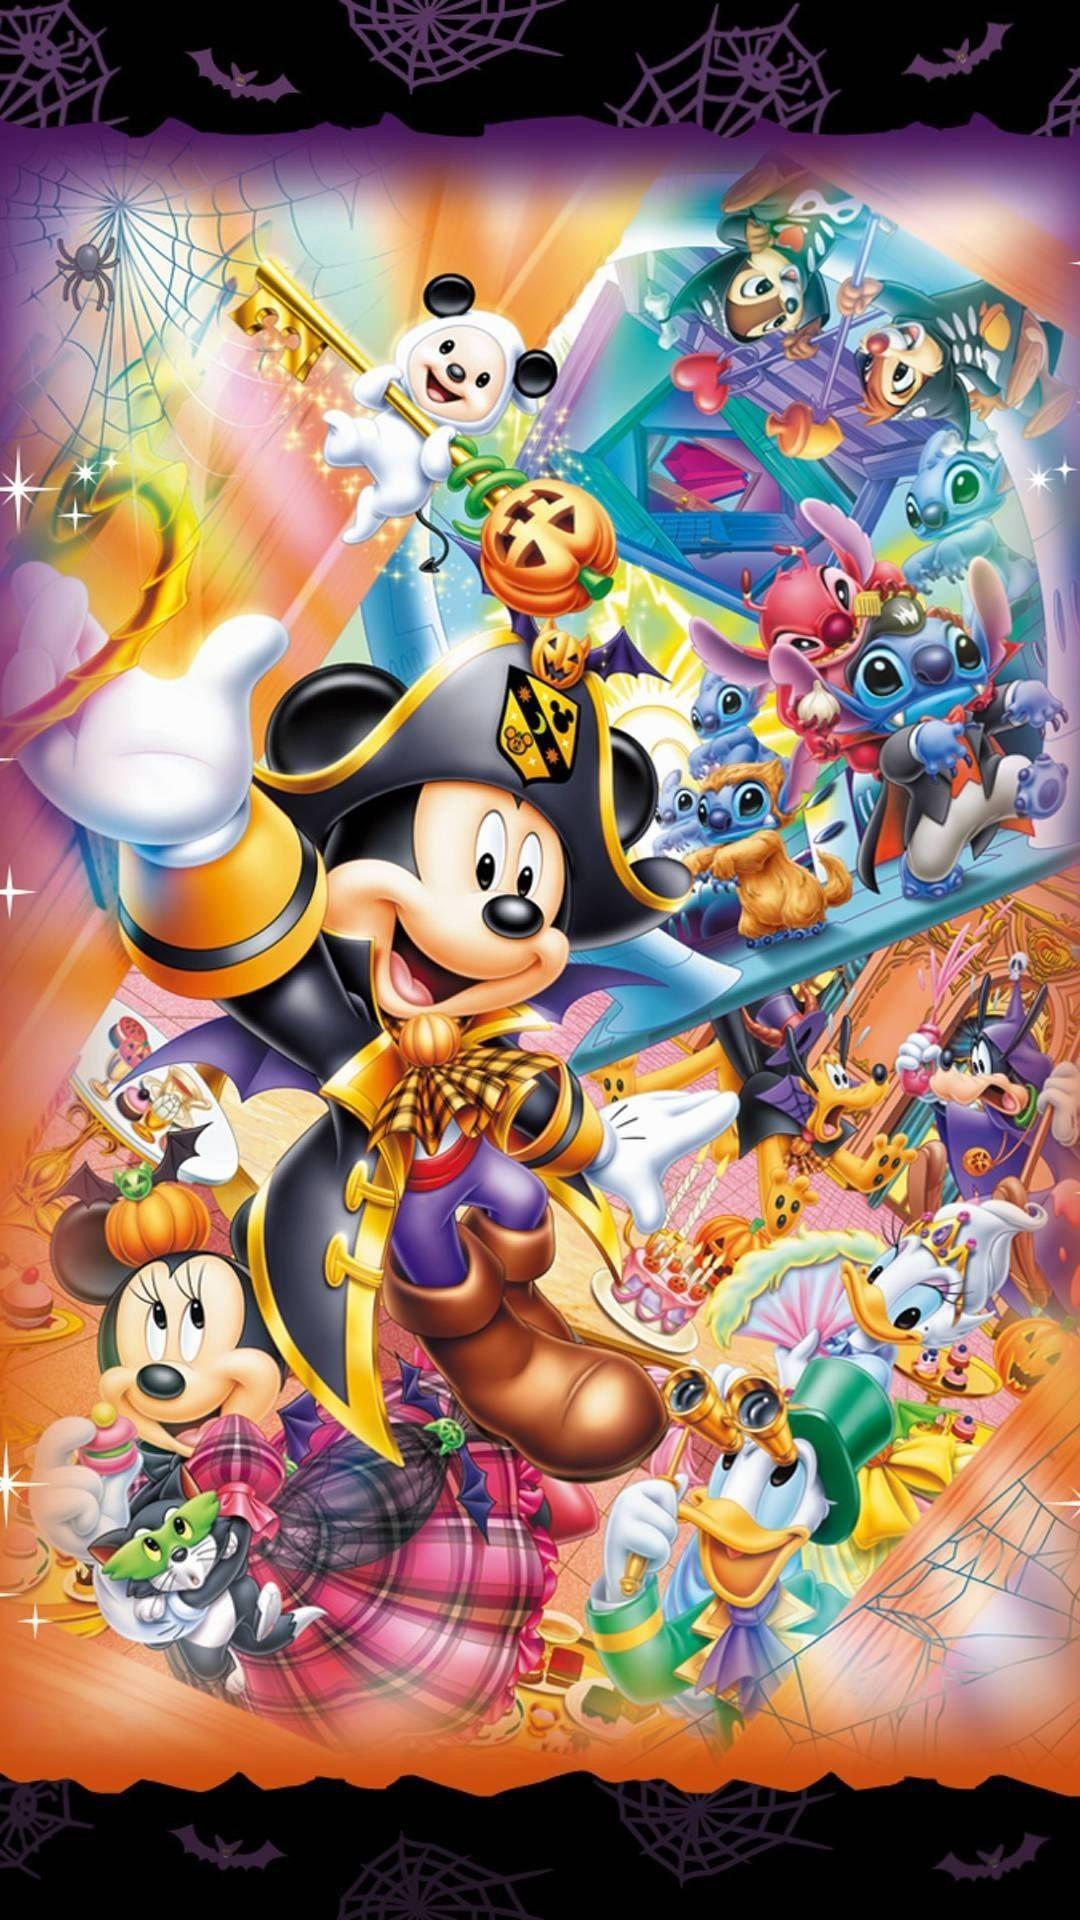 Cute Disney Halloween Iphone Wallpapers Top Free Cute Disney Halloween Iphone Backgrounds Wallpaperaccess